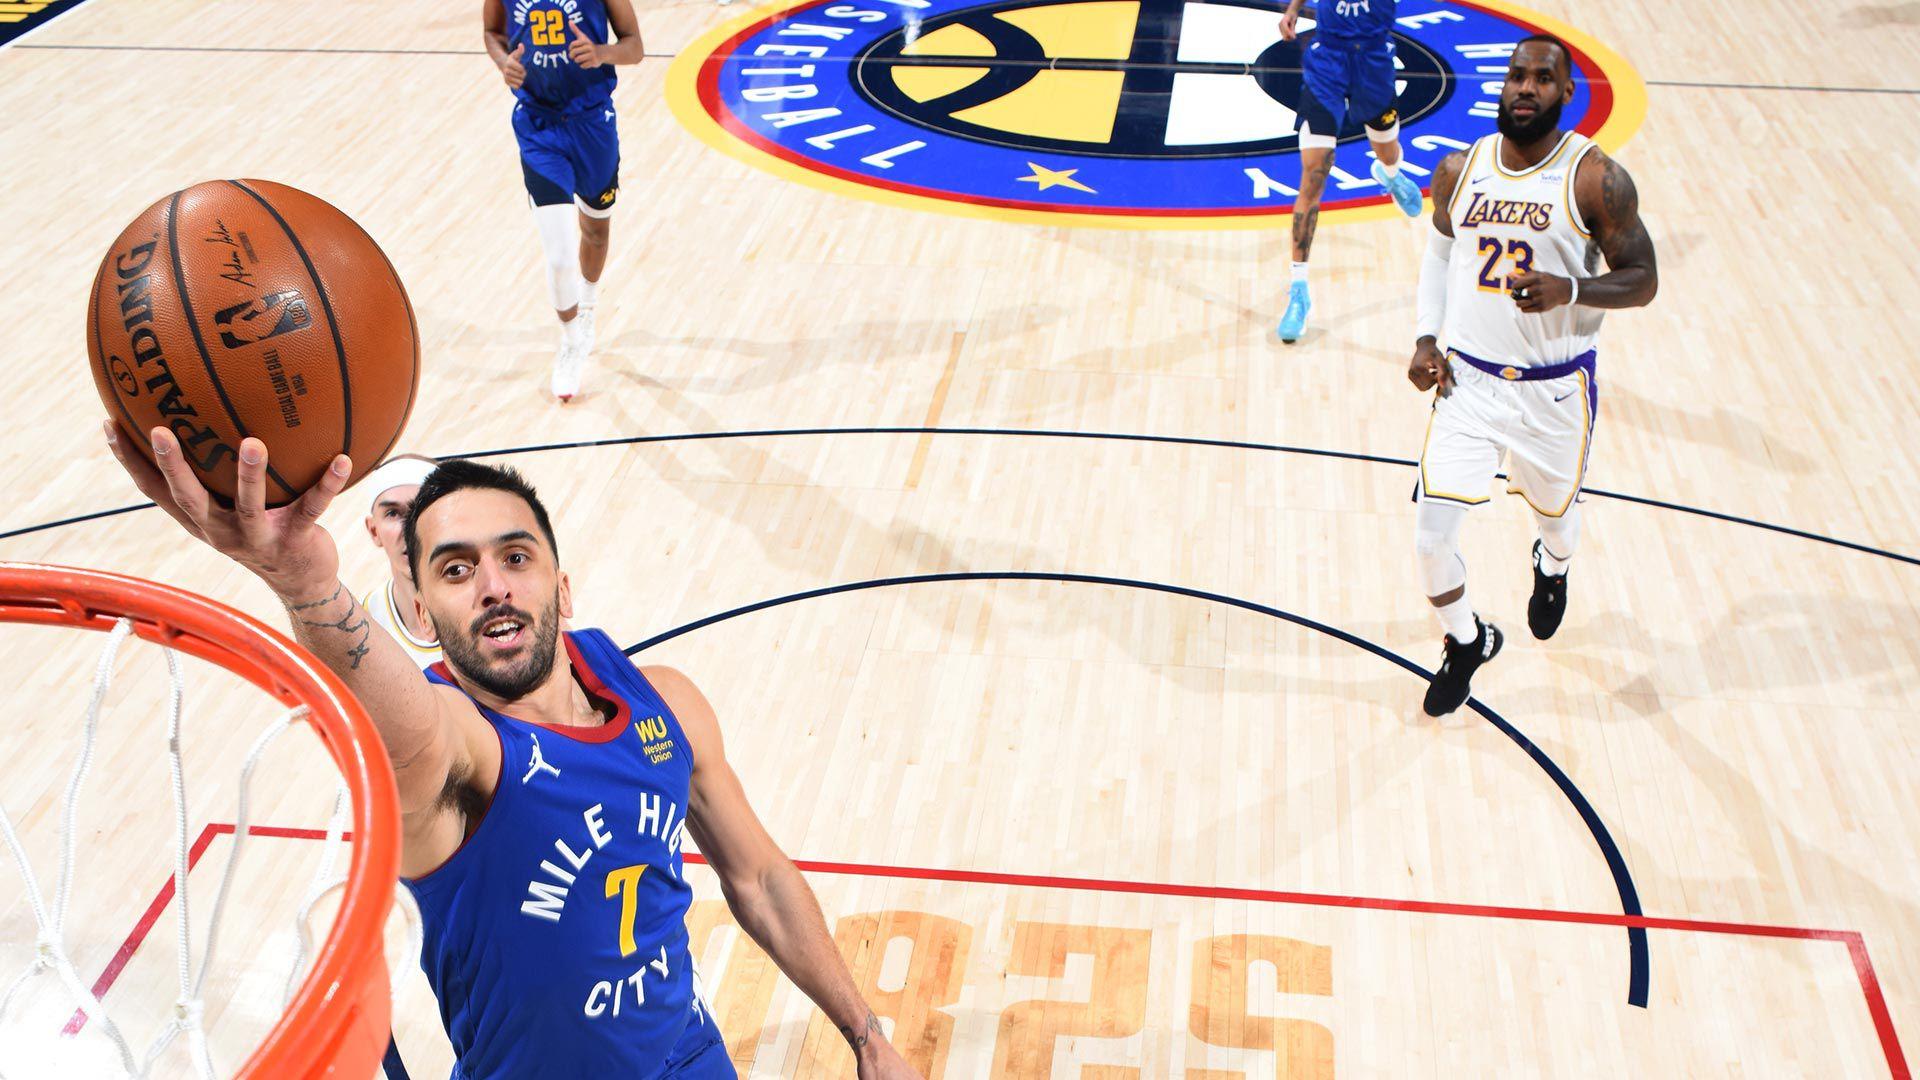 Campazzo vs los Lakers